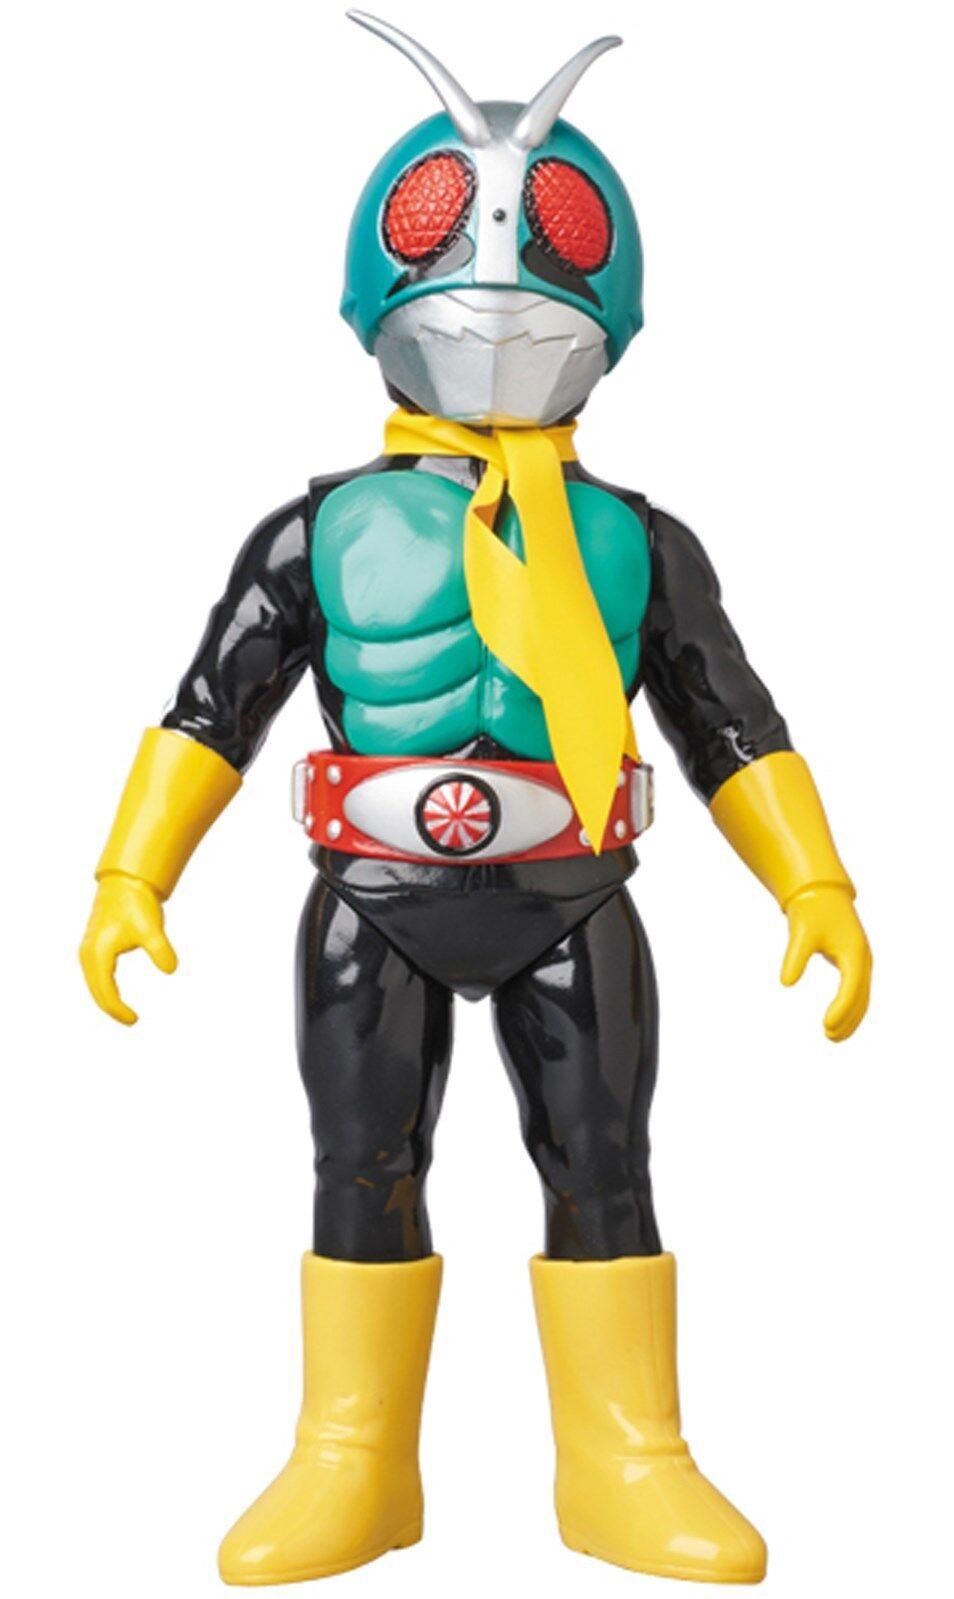 Masked Rider Kaijin Shocker Rider Retro Sofubi Soft Vinyl Figure 24cm MedicomToy